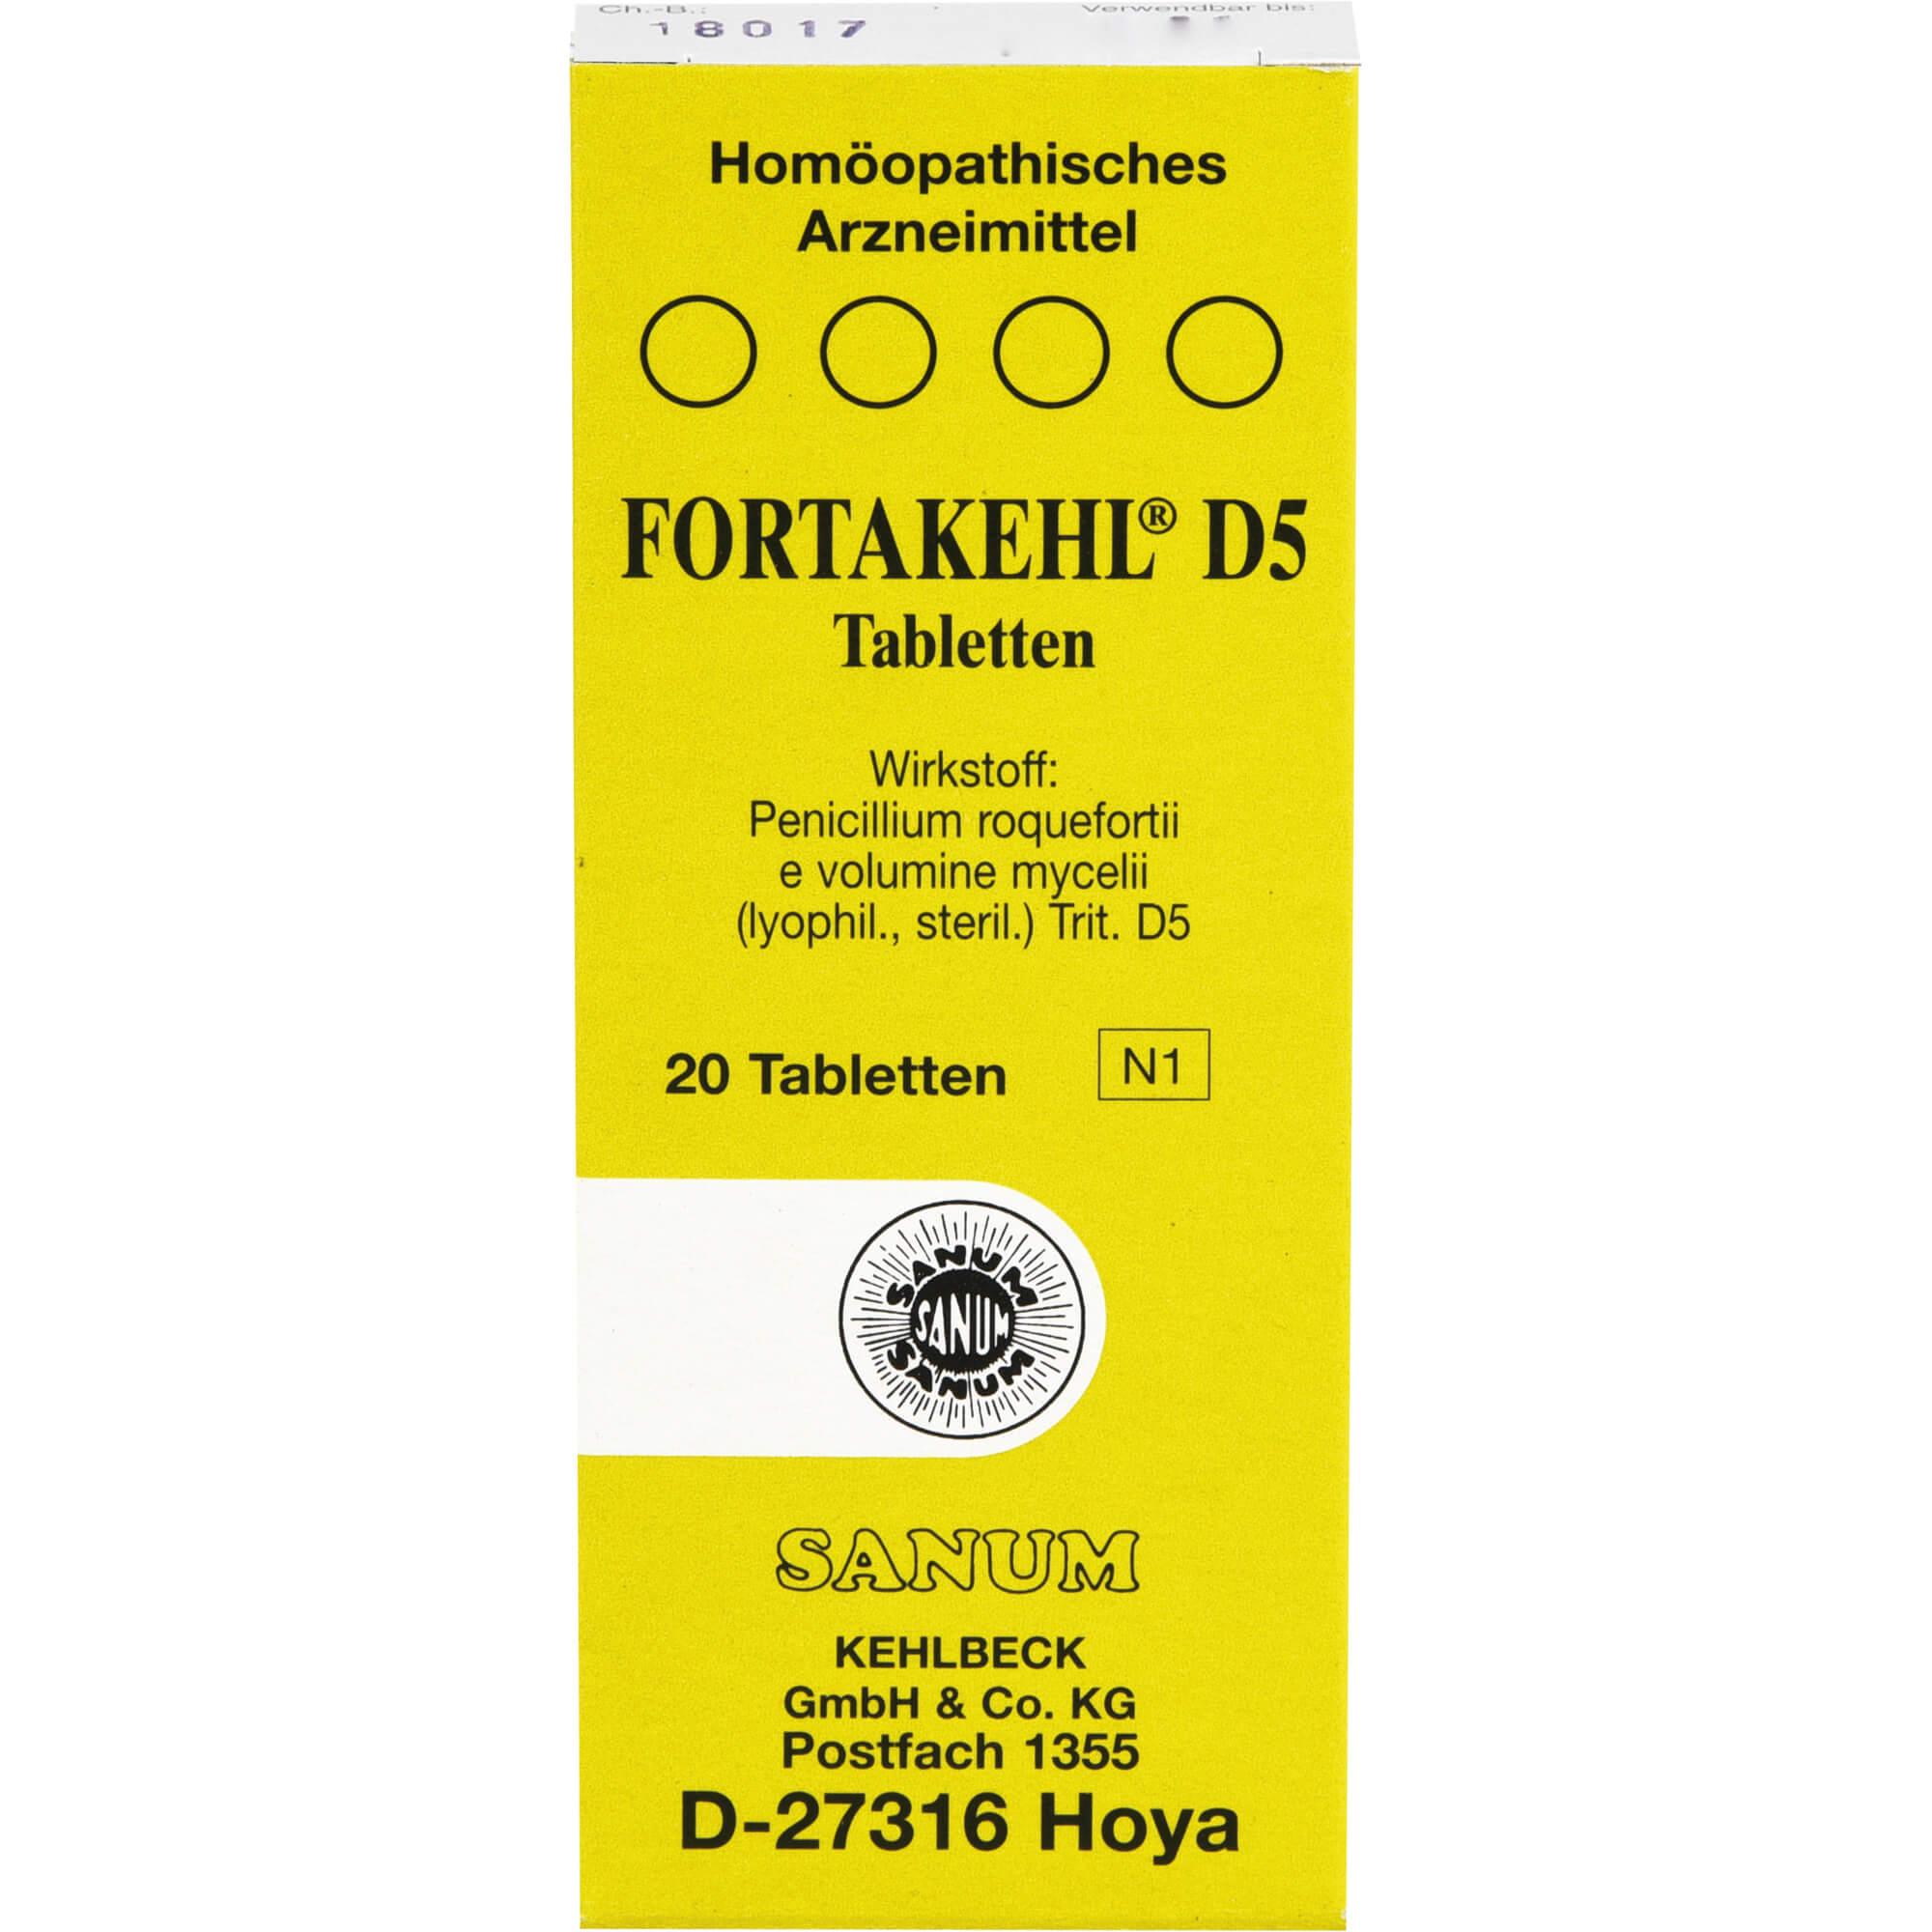 FORTAKEHL-D-5-Tabletten